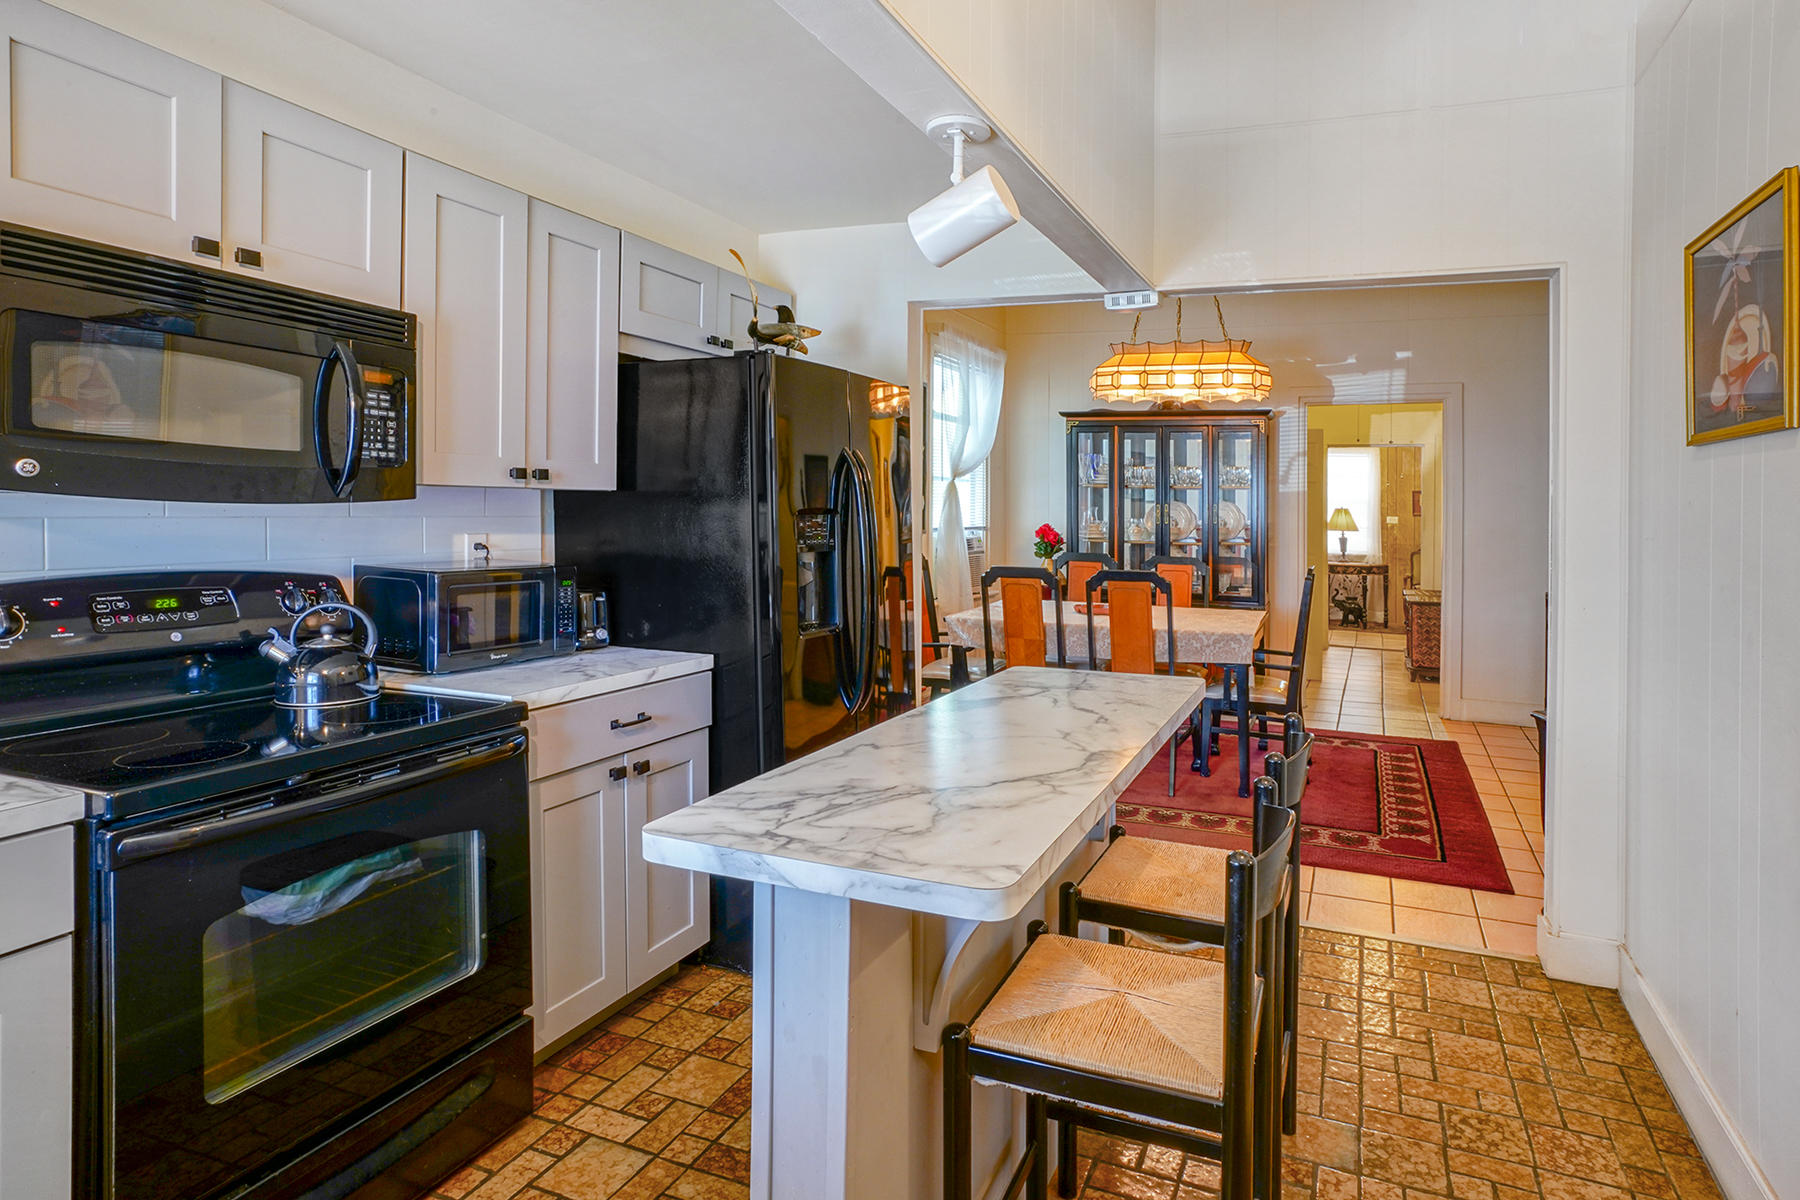 709 Whitehead Street, Key West, Florida 33040, 3 Bedrooms Bedrooms, ,2 BathroomsBathrooms,Single Family,For Sale,709 Whitehead Street,593969